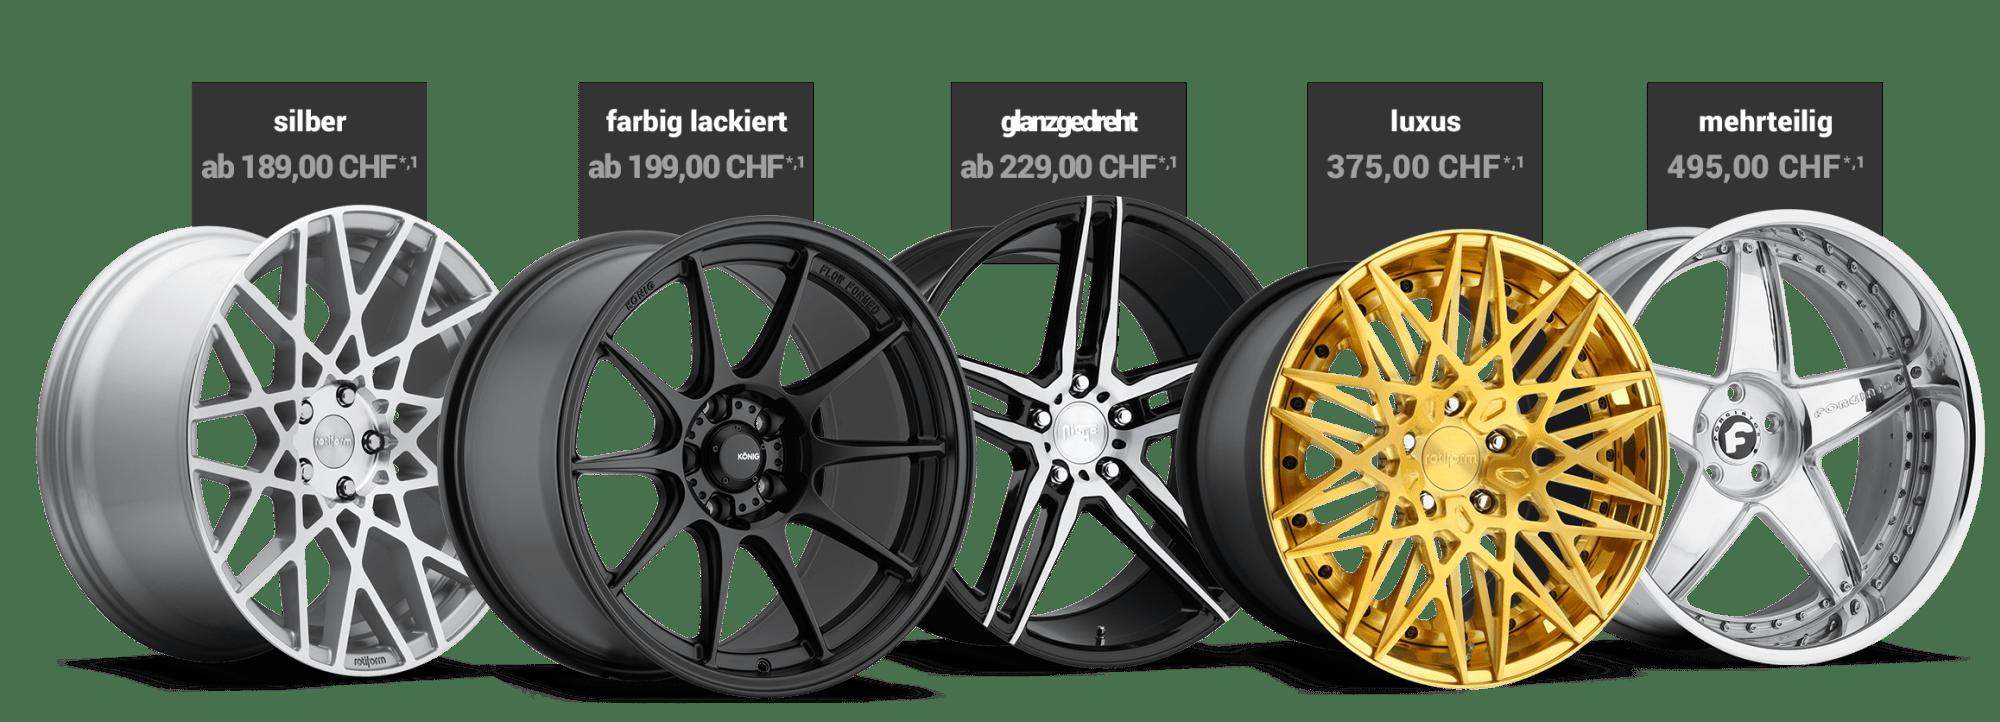 pricing_german